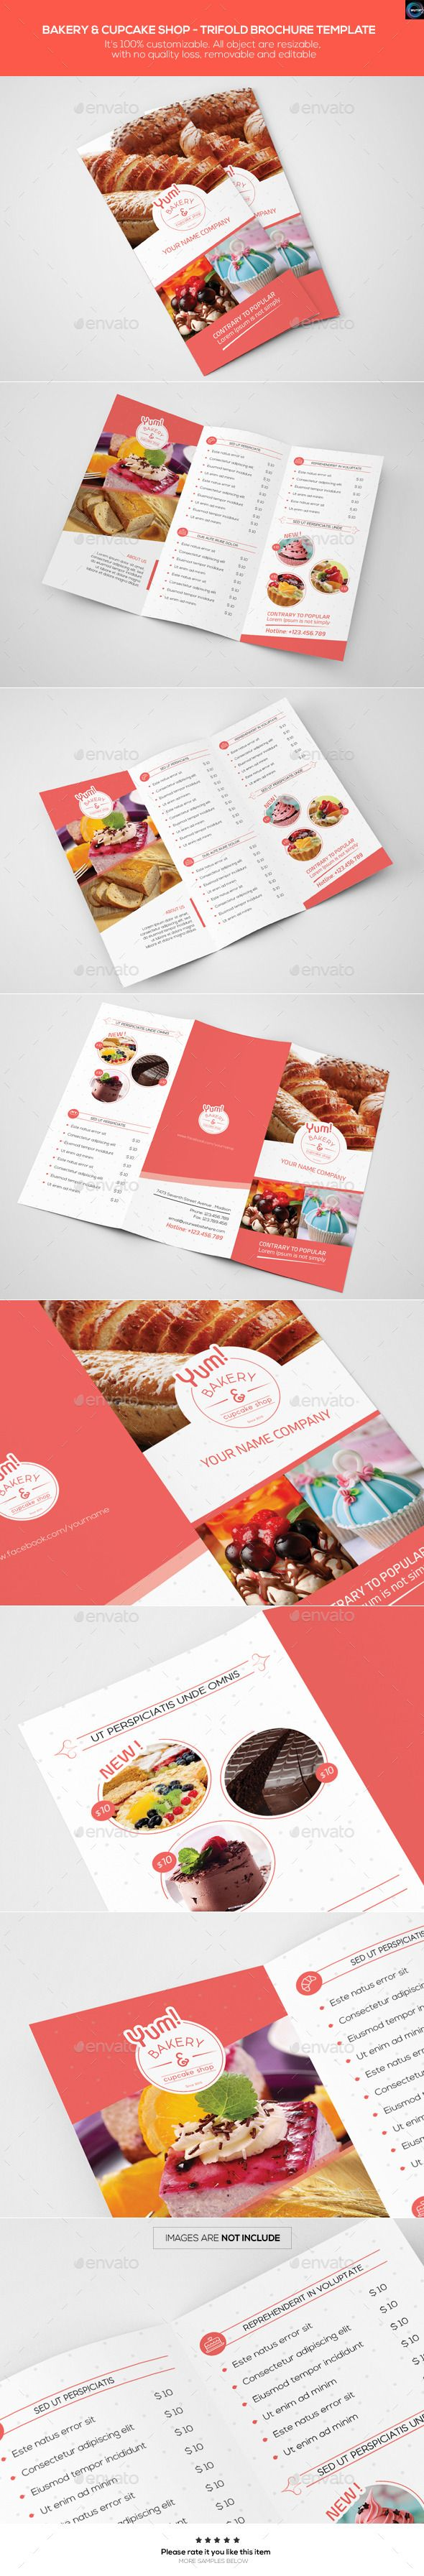 Bakery & Cupcake Shop - Trifold Brochure Template #design #broschüre Download: http://graphicriver.net/item/bakery-cupcake-shop-trifold-brochure-template/12494130?ref=ksioks